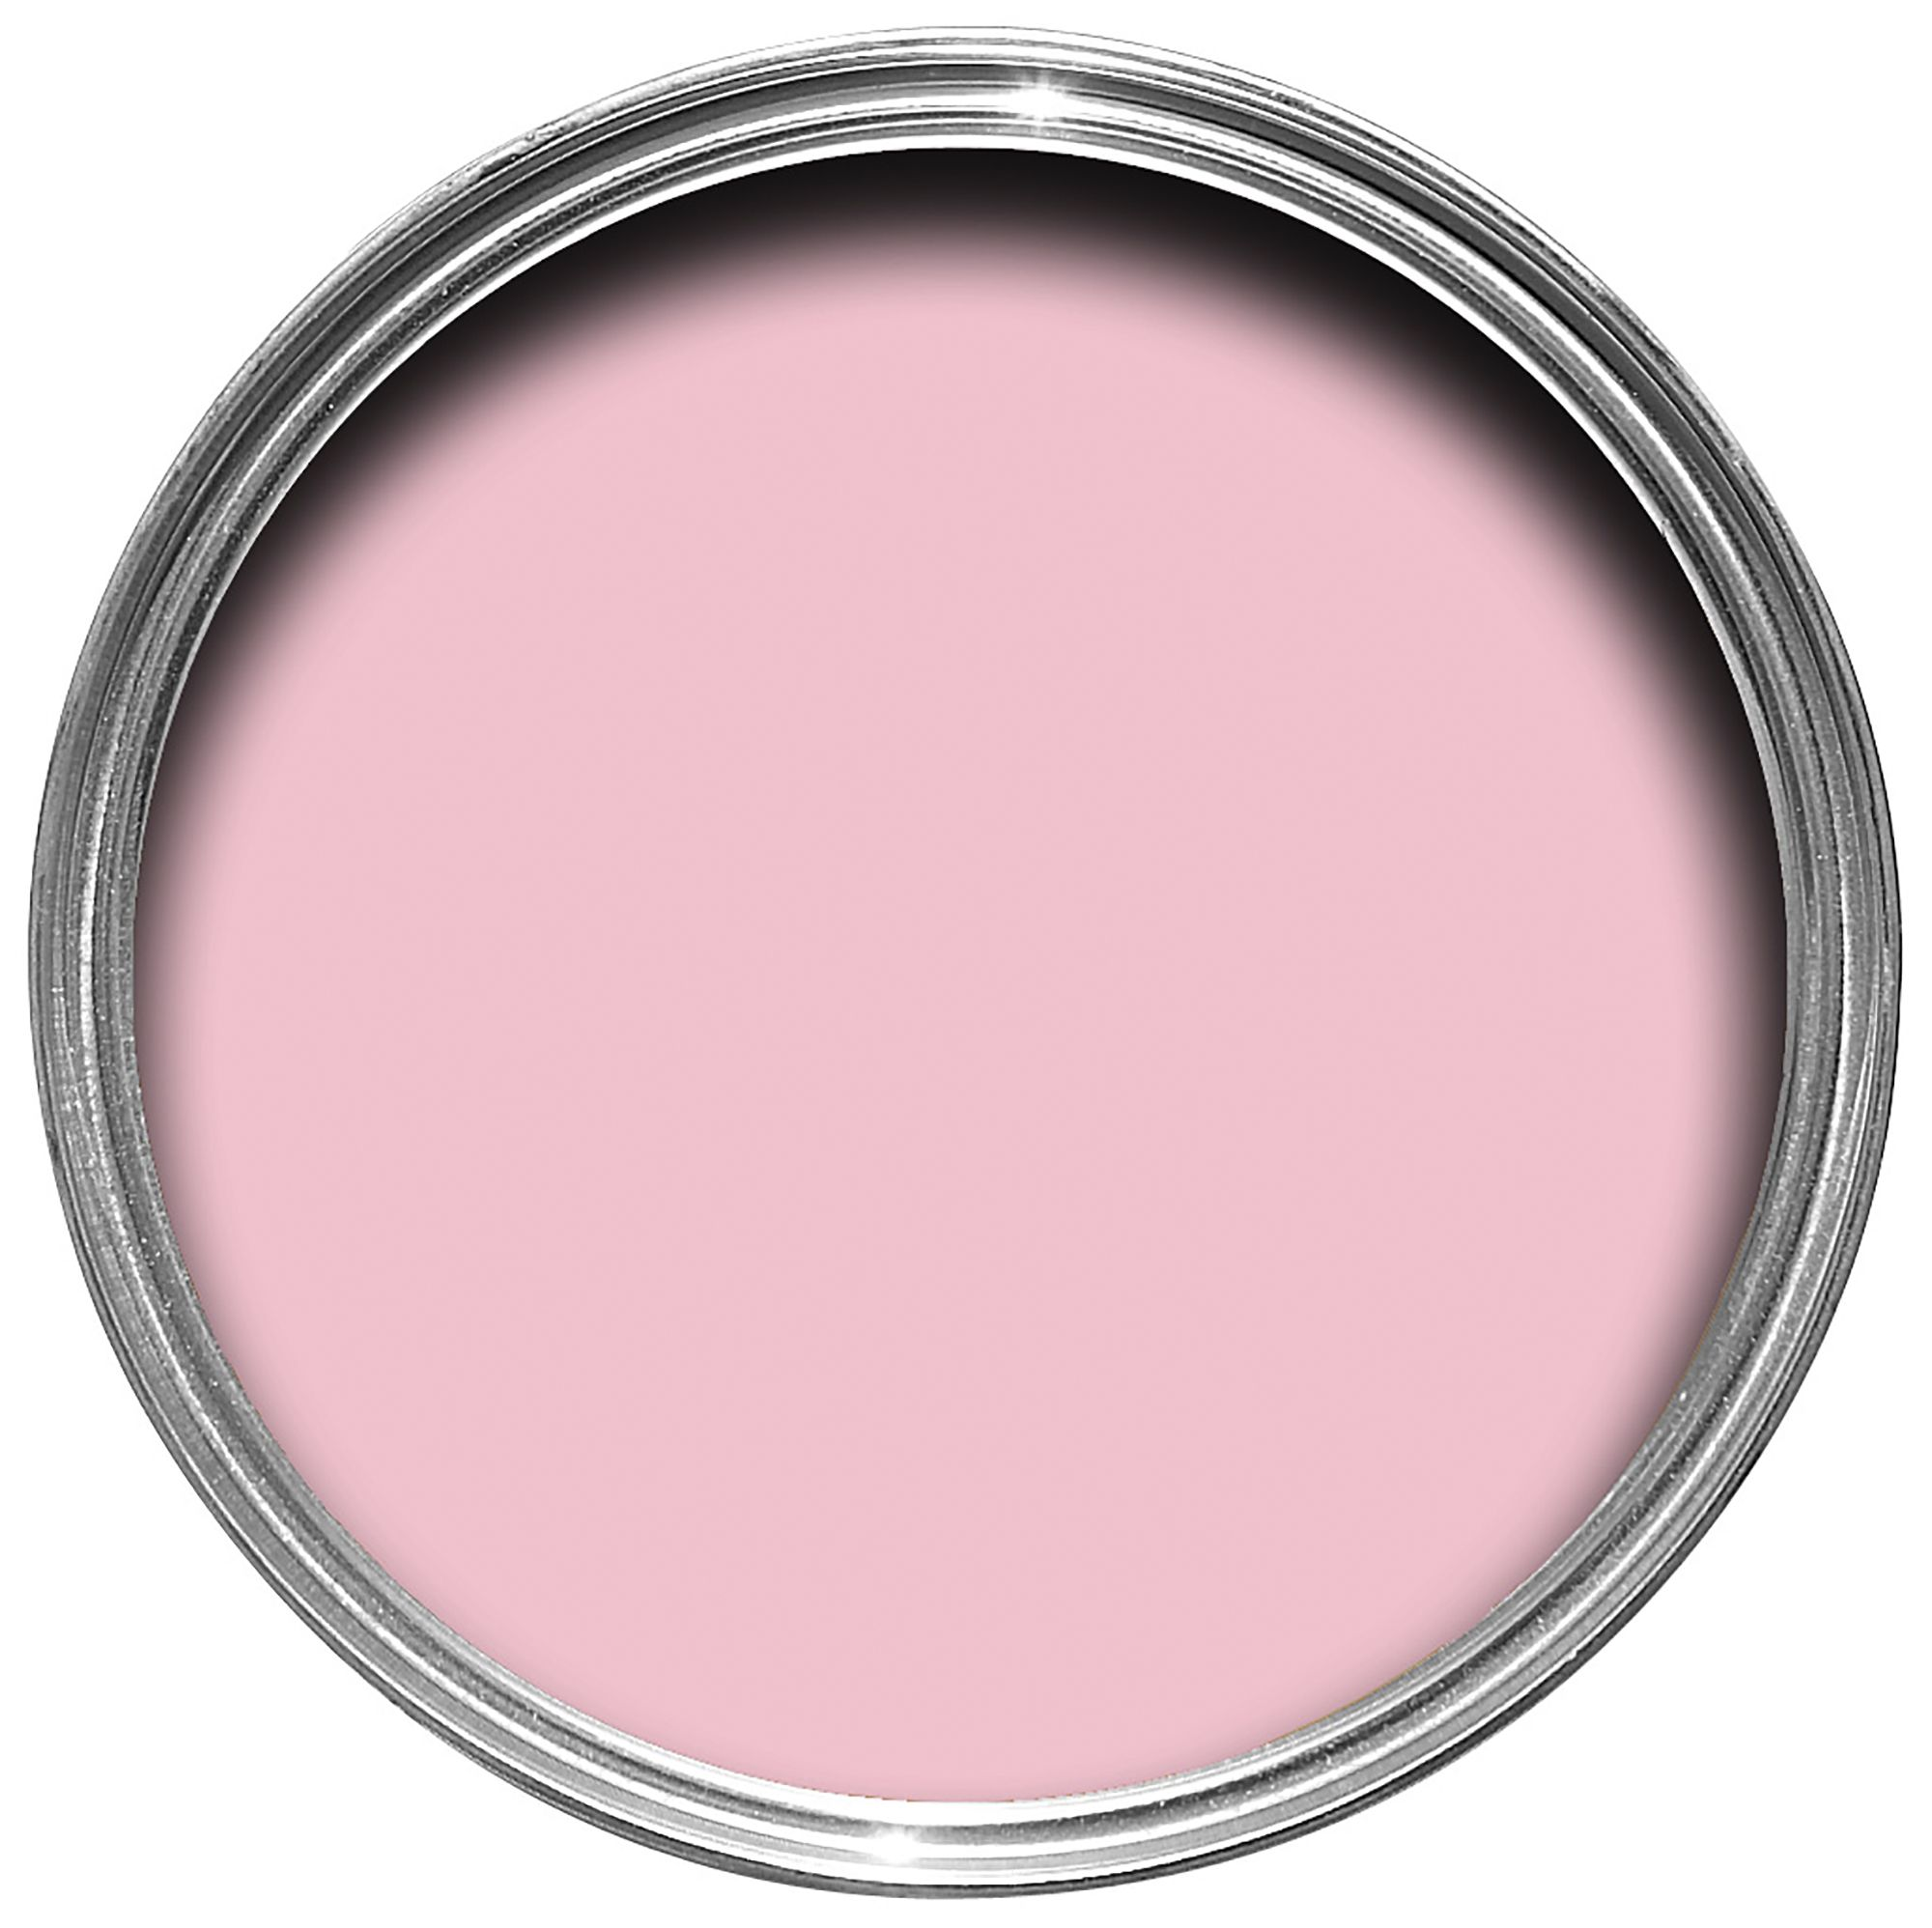 colours pink pink matt emulsion paint 2 5l departments. Black Bedroom Furniture Sets. Home Design Ideas